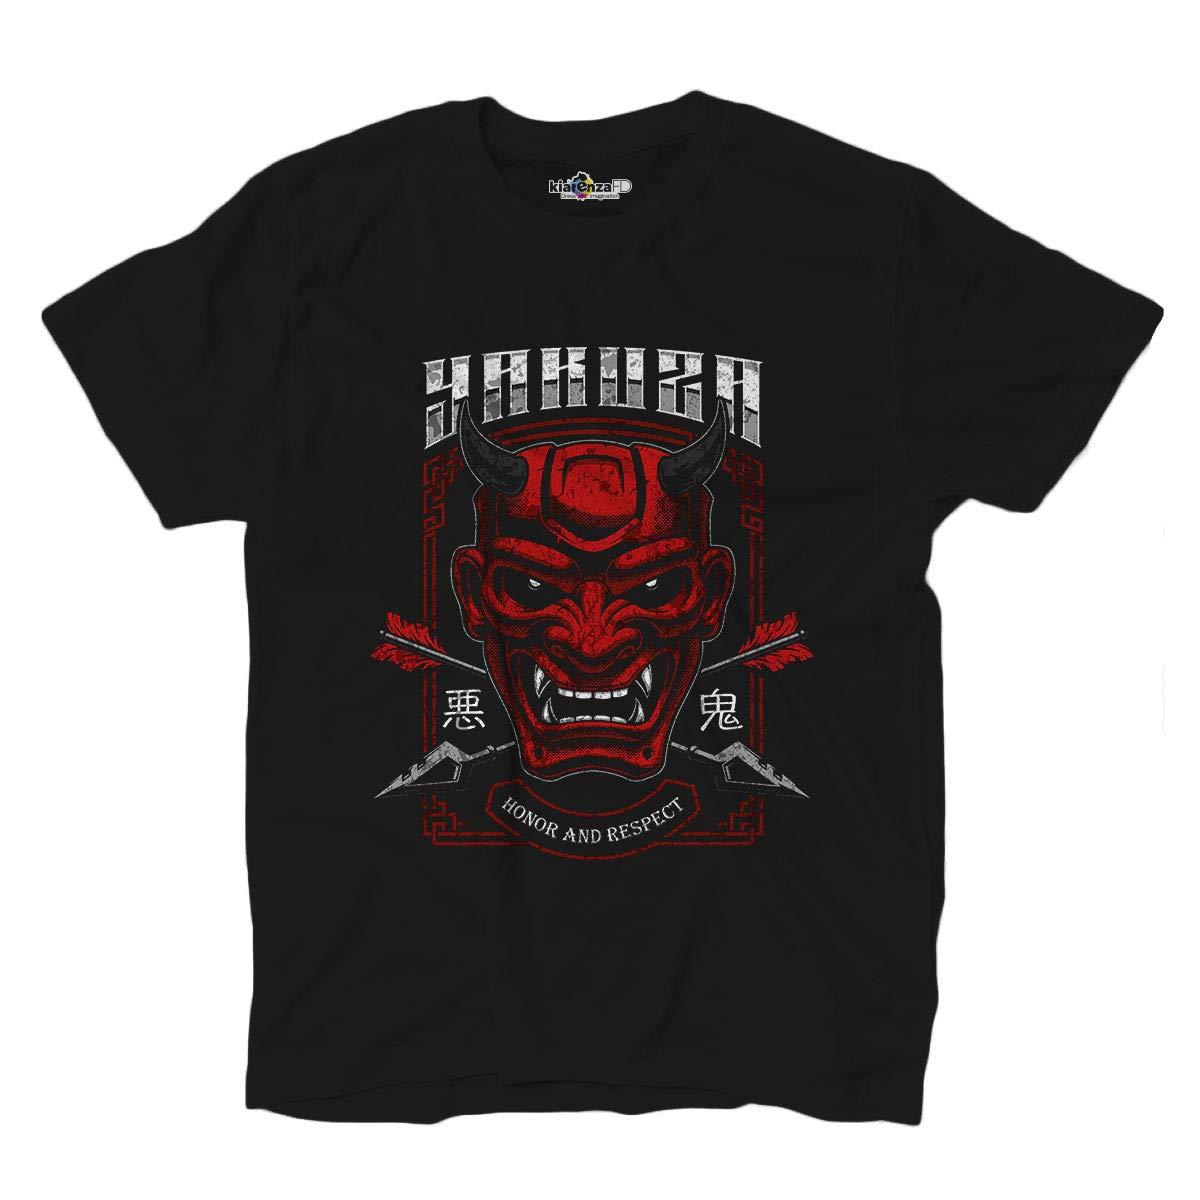 KiarenzaFD T-Shirt Yakuza Honor Respect Gokudo Japanese Mob Gangs Black Shirts Summer Style Hip Hop Men T Shirt Tops Tee